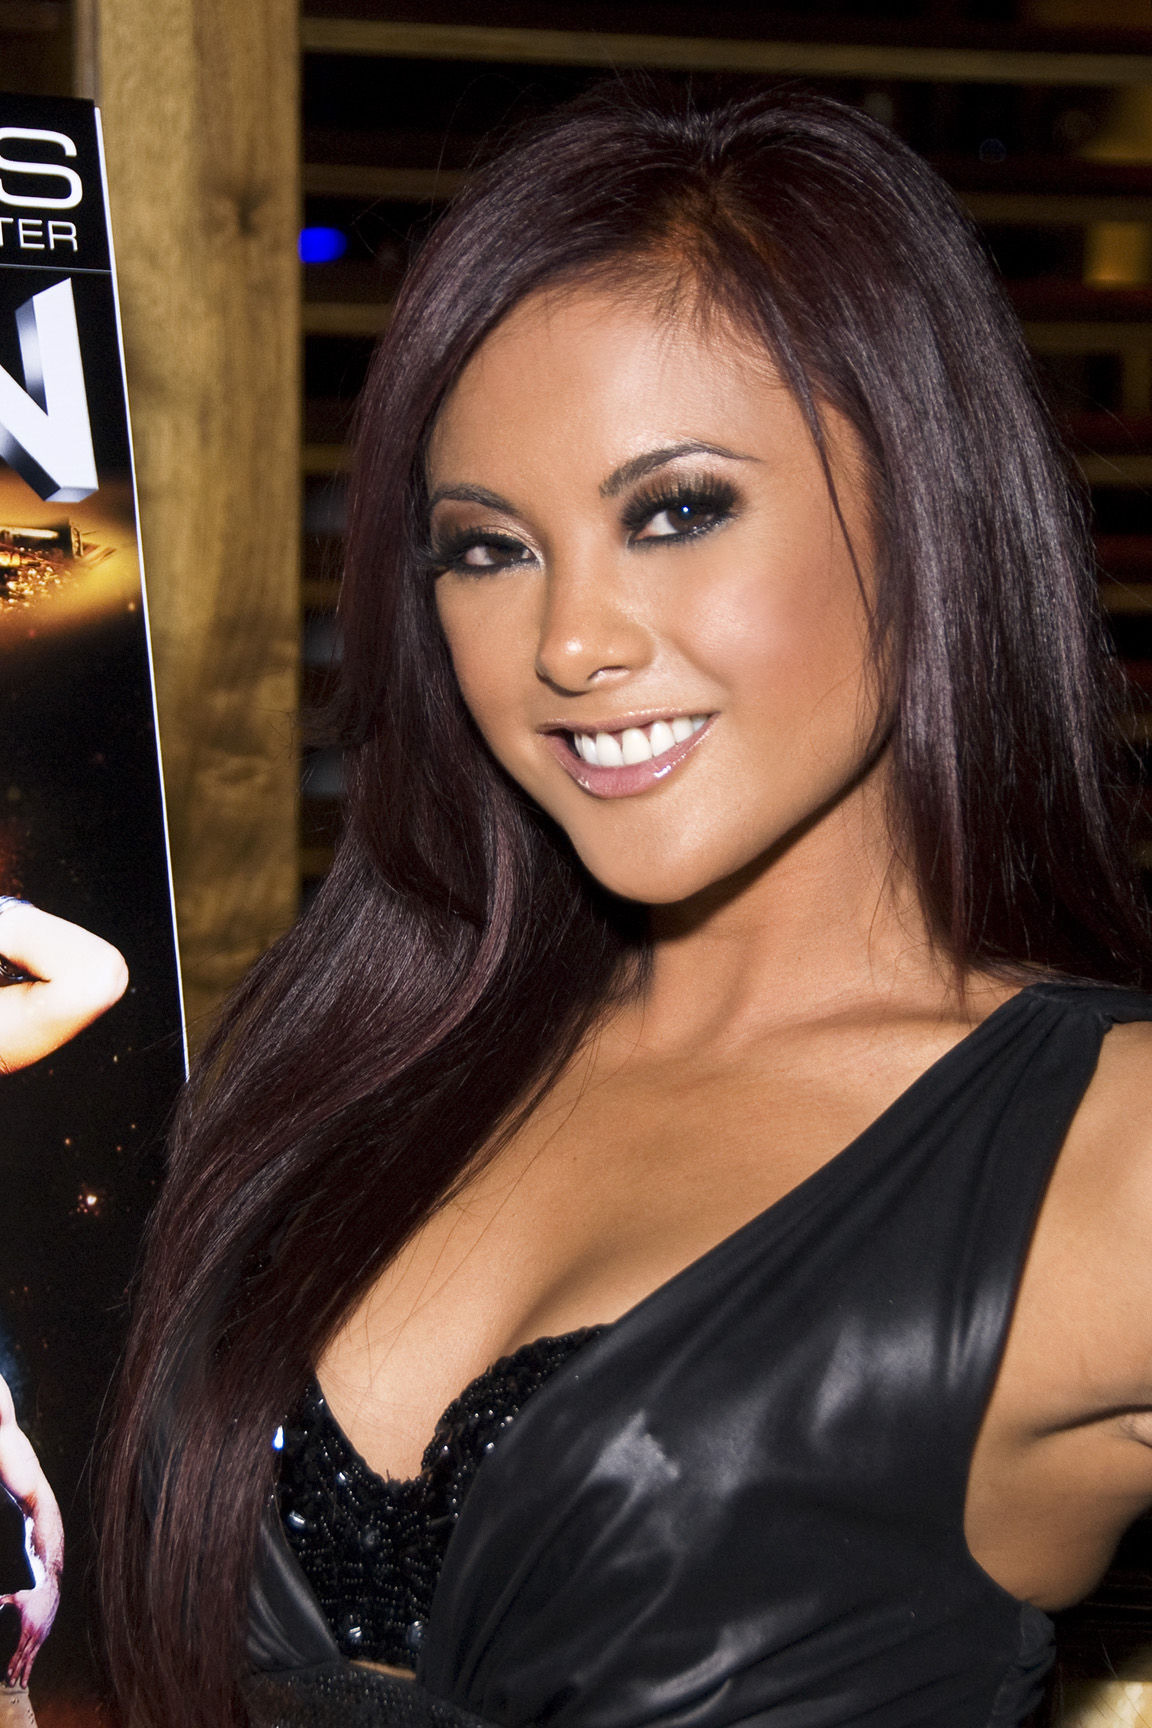 Photo of Kaylani Lei: American pornographic actress